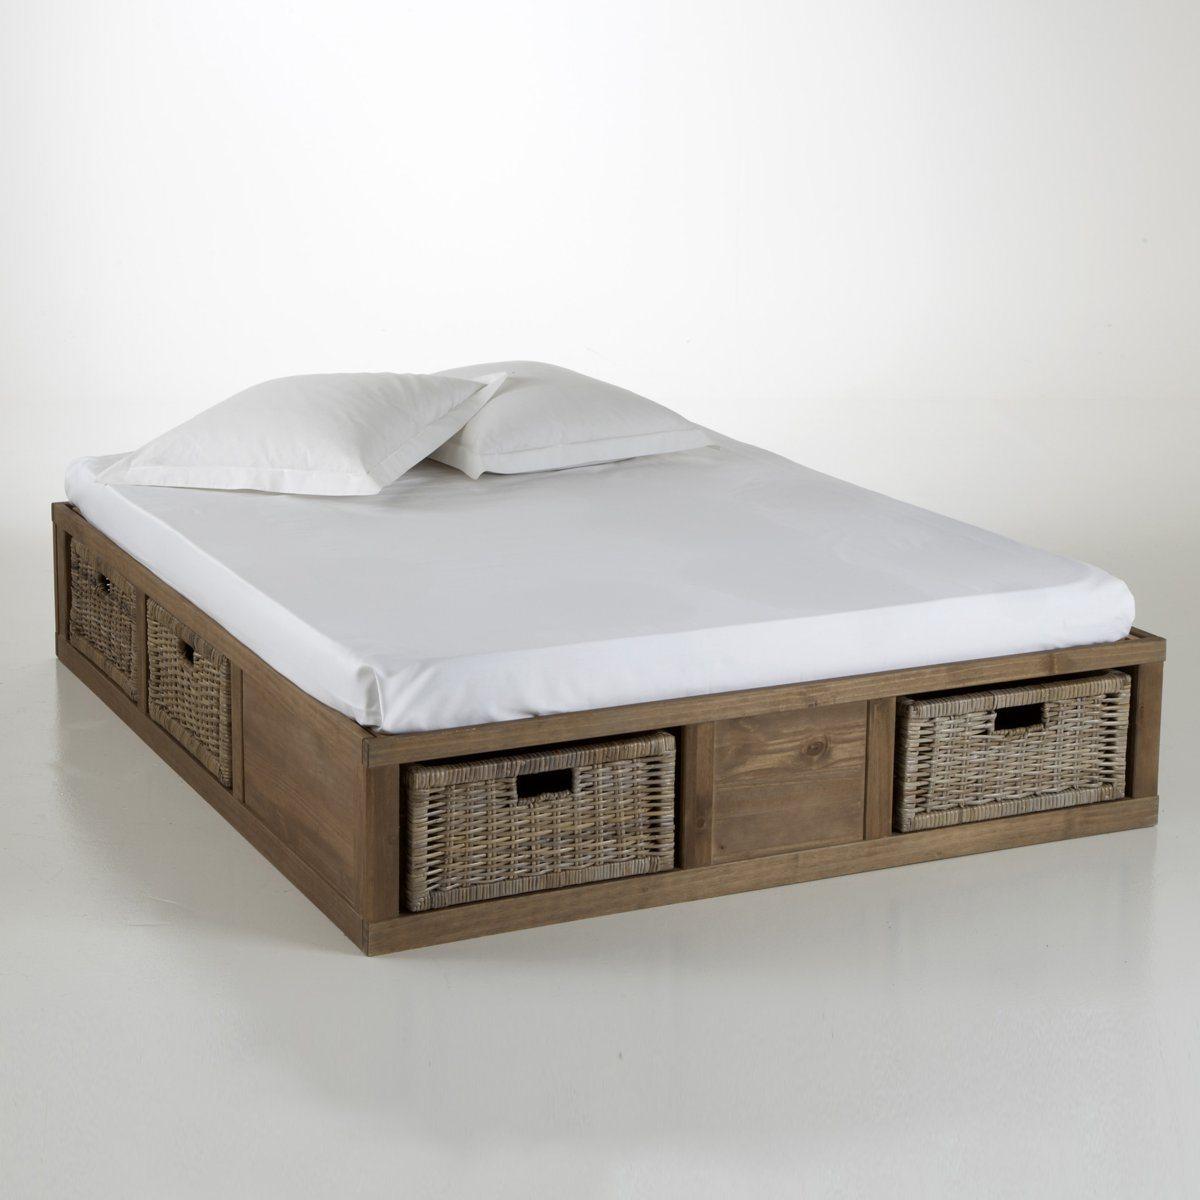 lit rangements pin massif malu lit la redoute. Black Bedroom Furniture Sets. Home Design Ideas